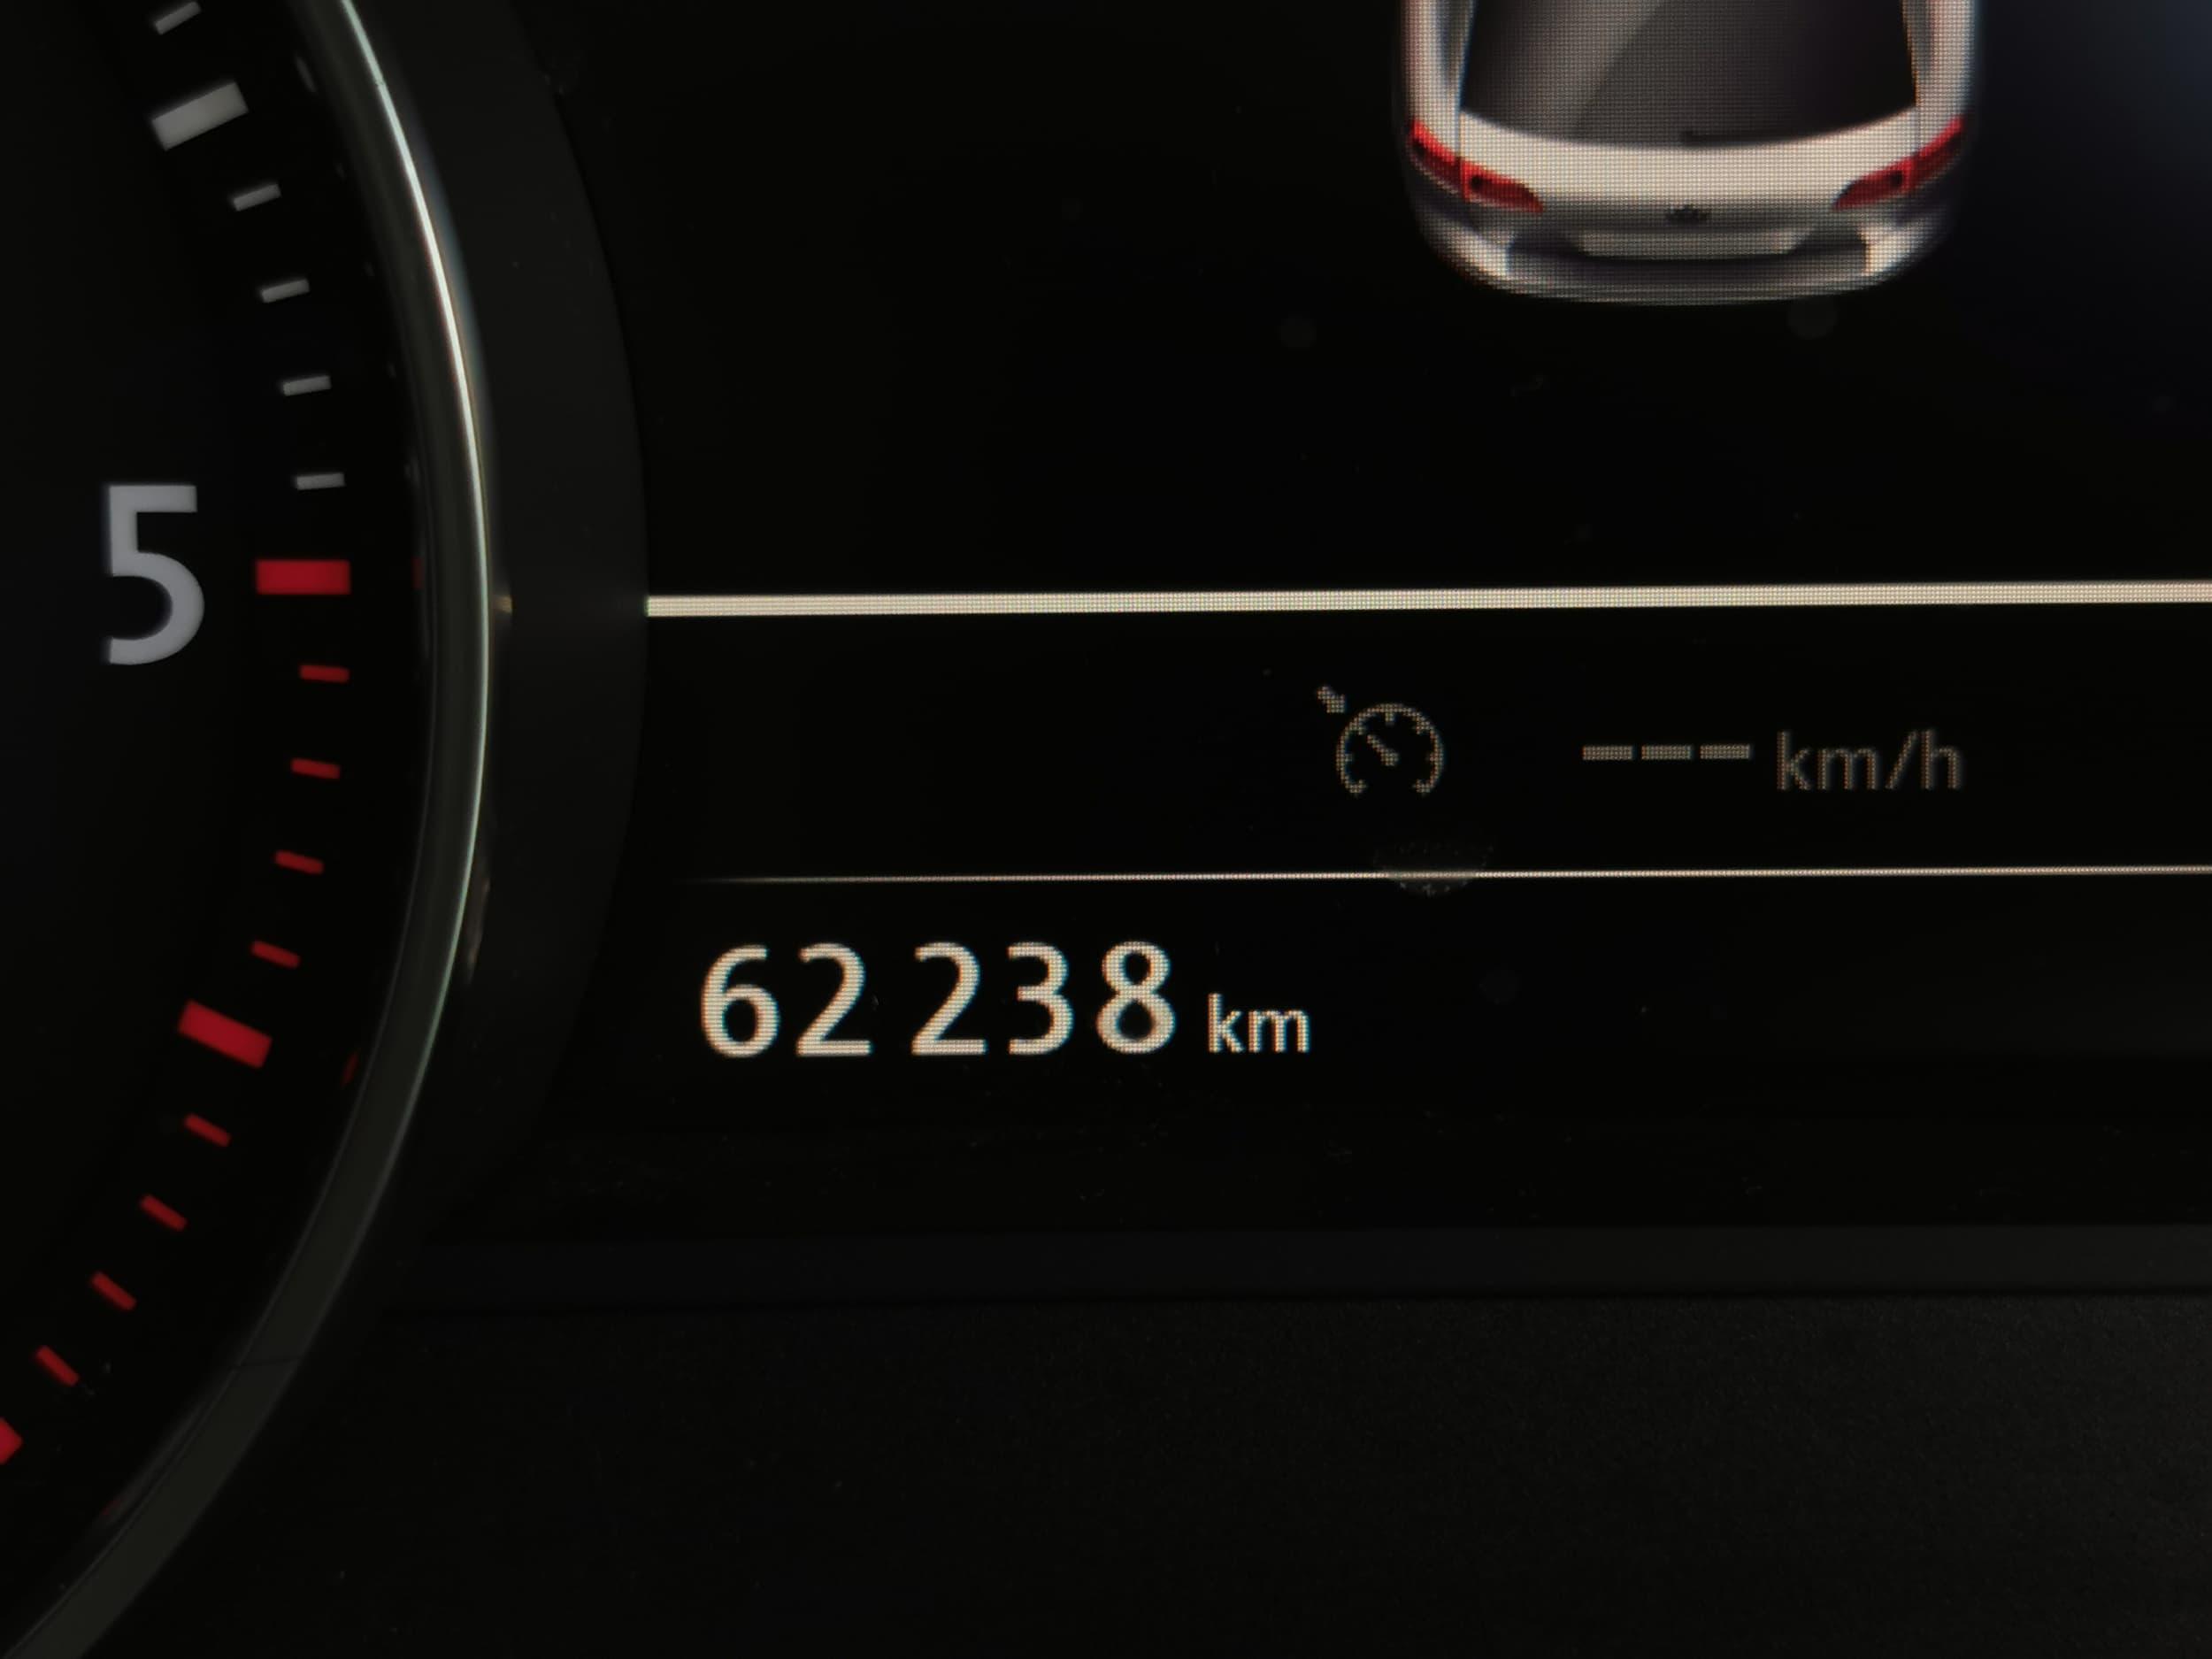 2015 Volkswagen Touareg V6 TDI 7P Auto 4MOTION MY16 - image 9